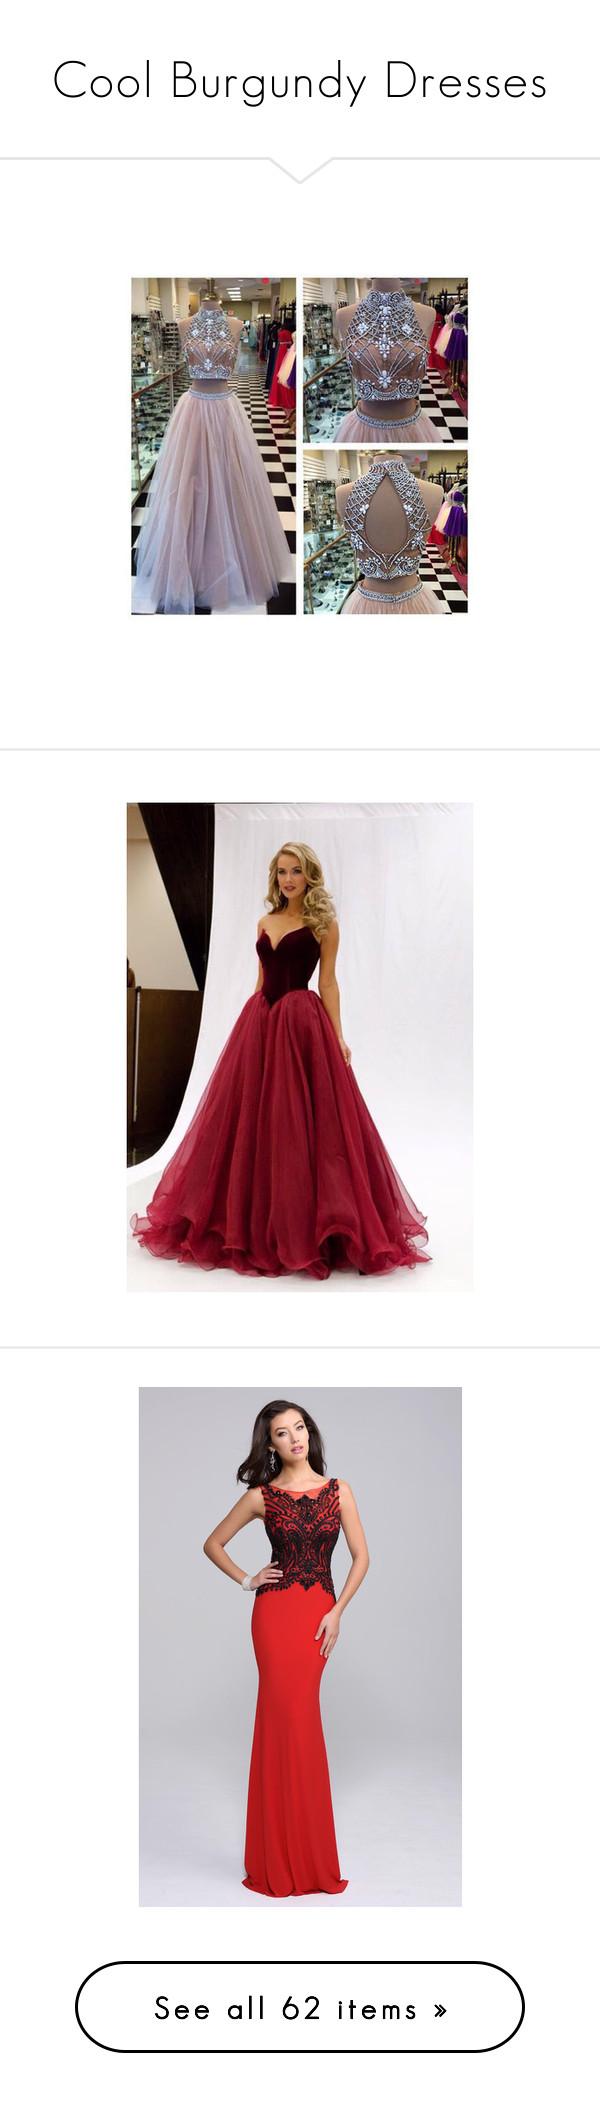 Cool burgundy dresses